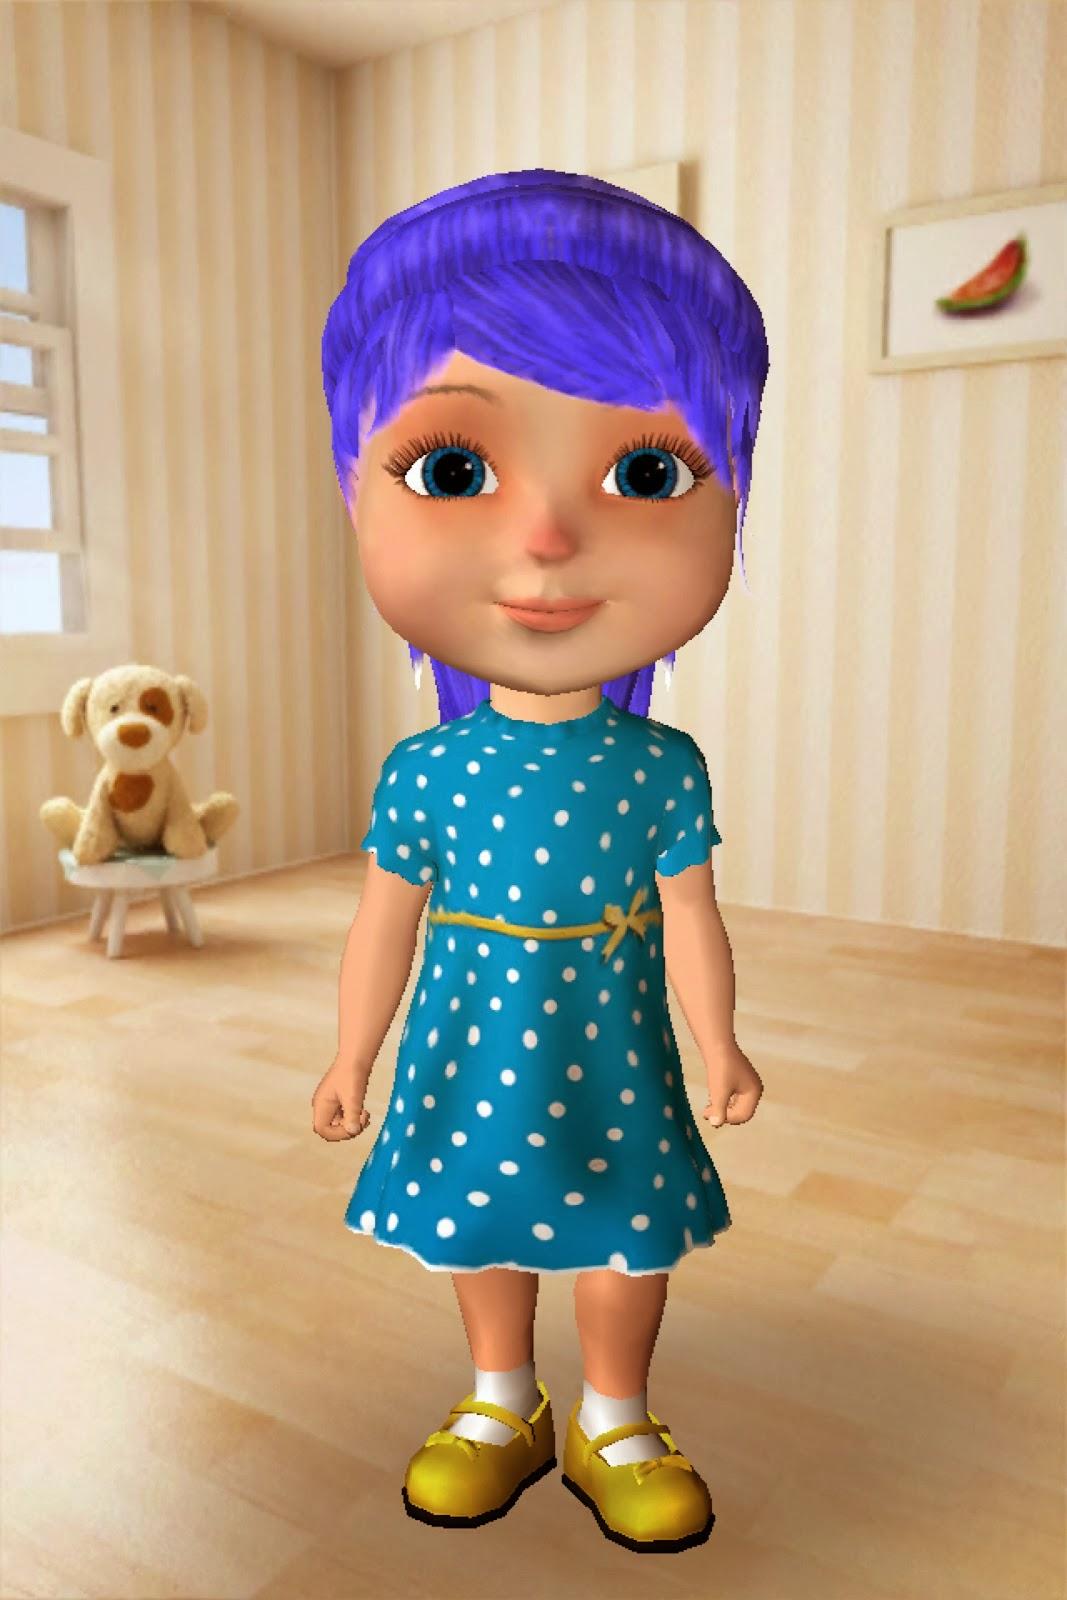 Talking Anya Dress-up & Pet Puppies App Review